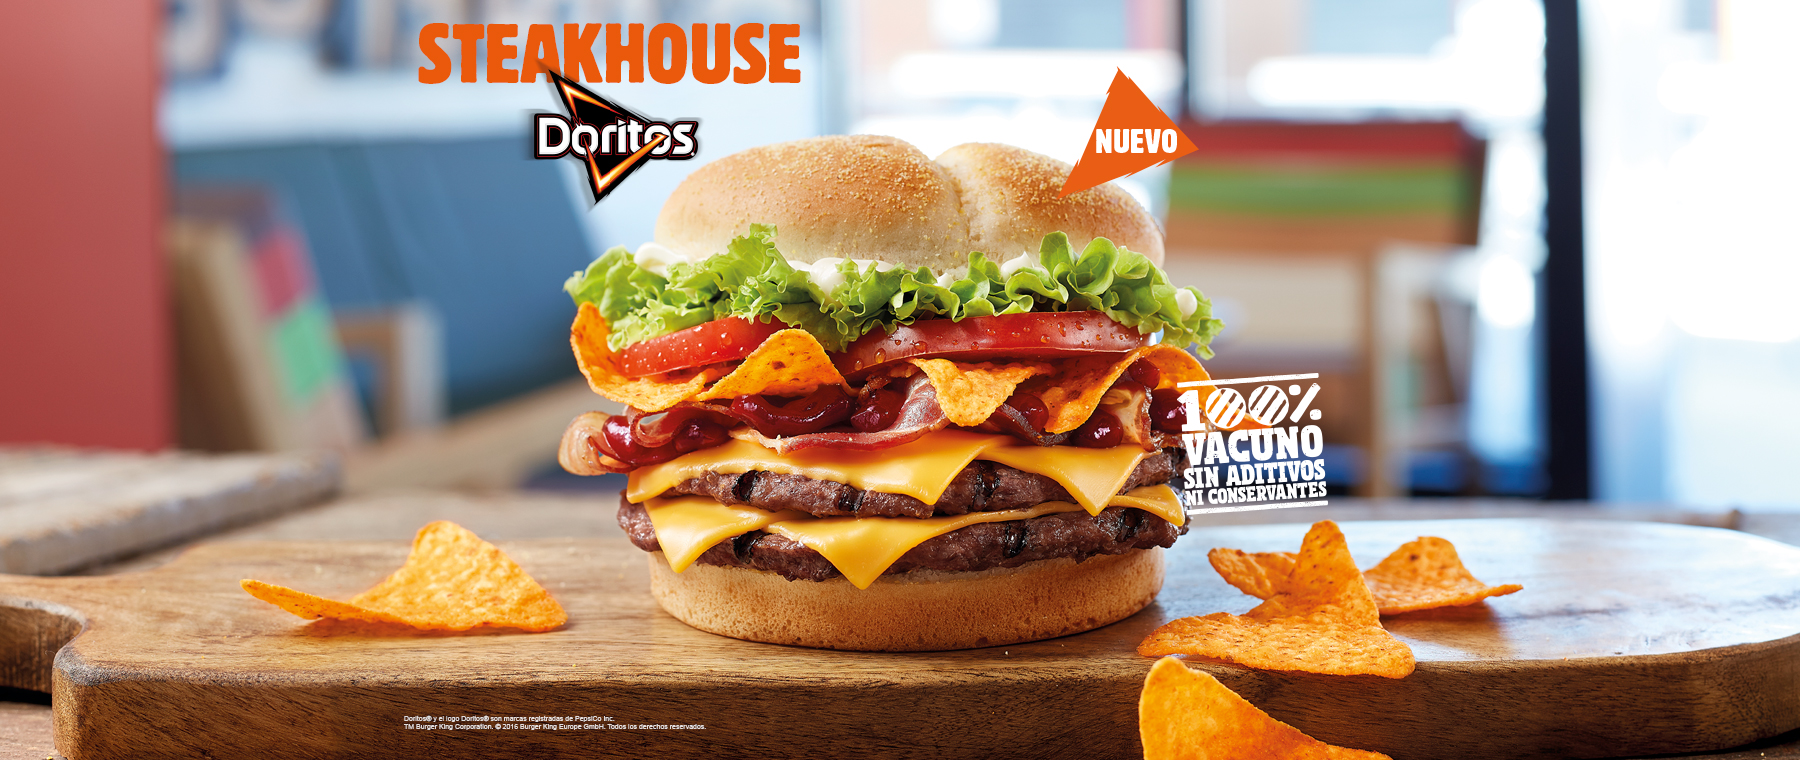 Burger King Spain Dumps Doritos On A Burger And Calls It A Day Neogaf